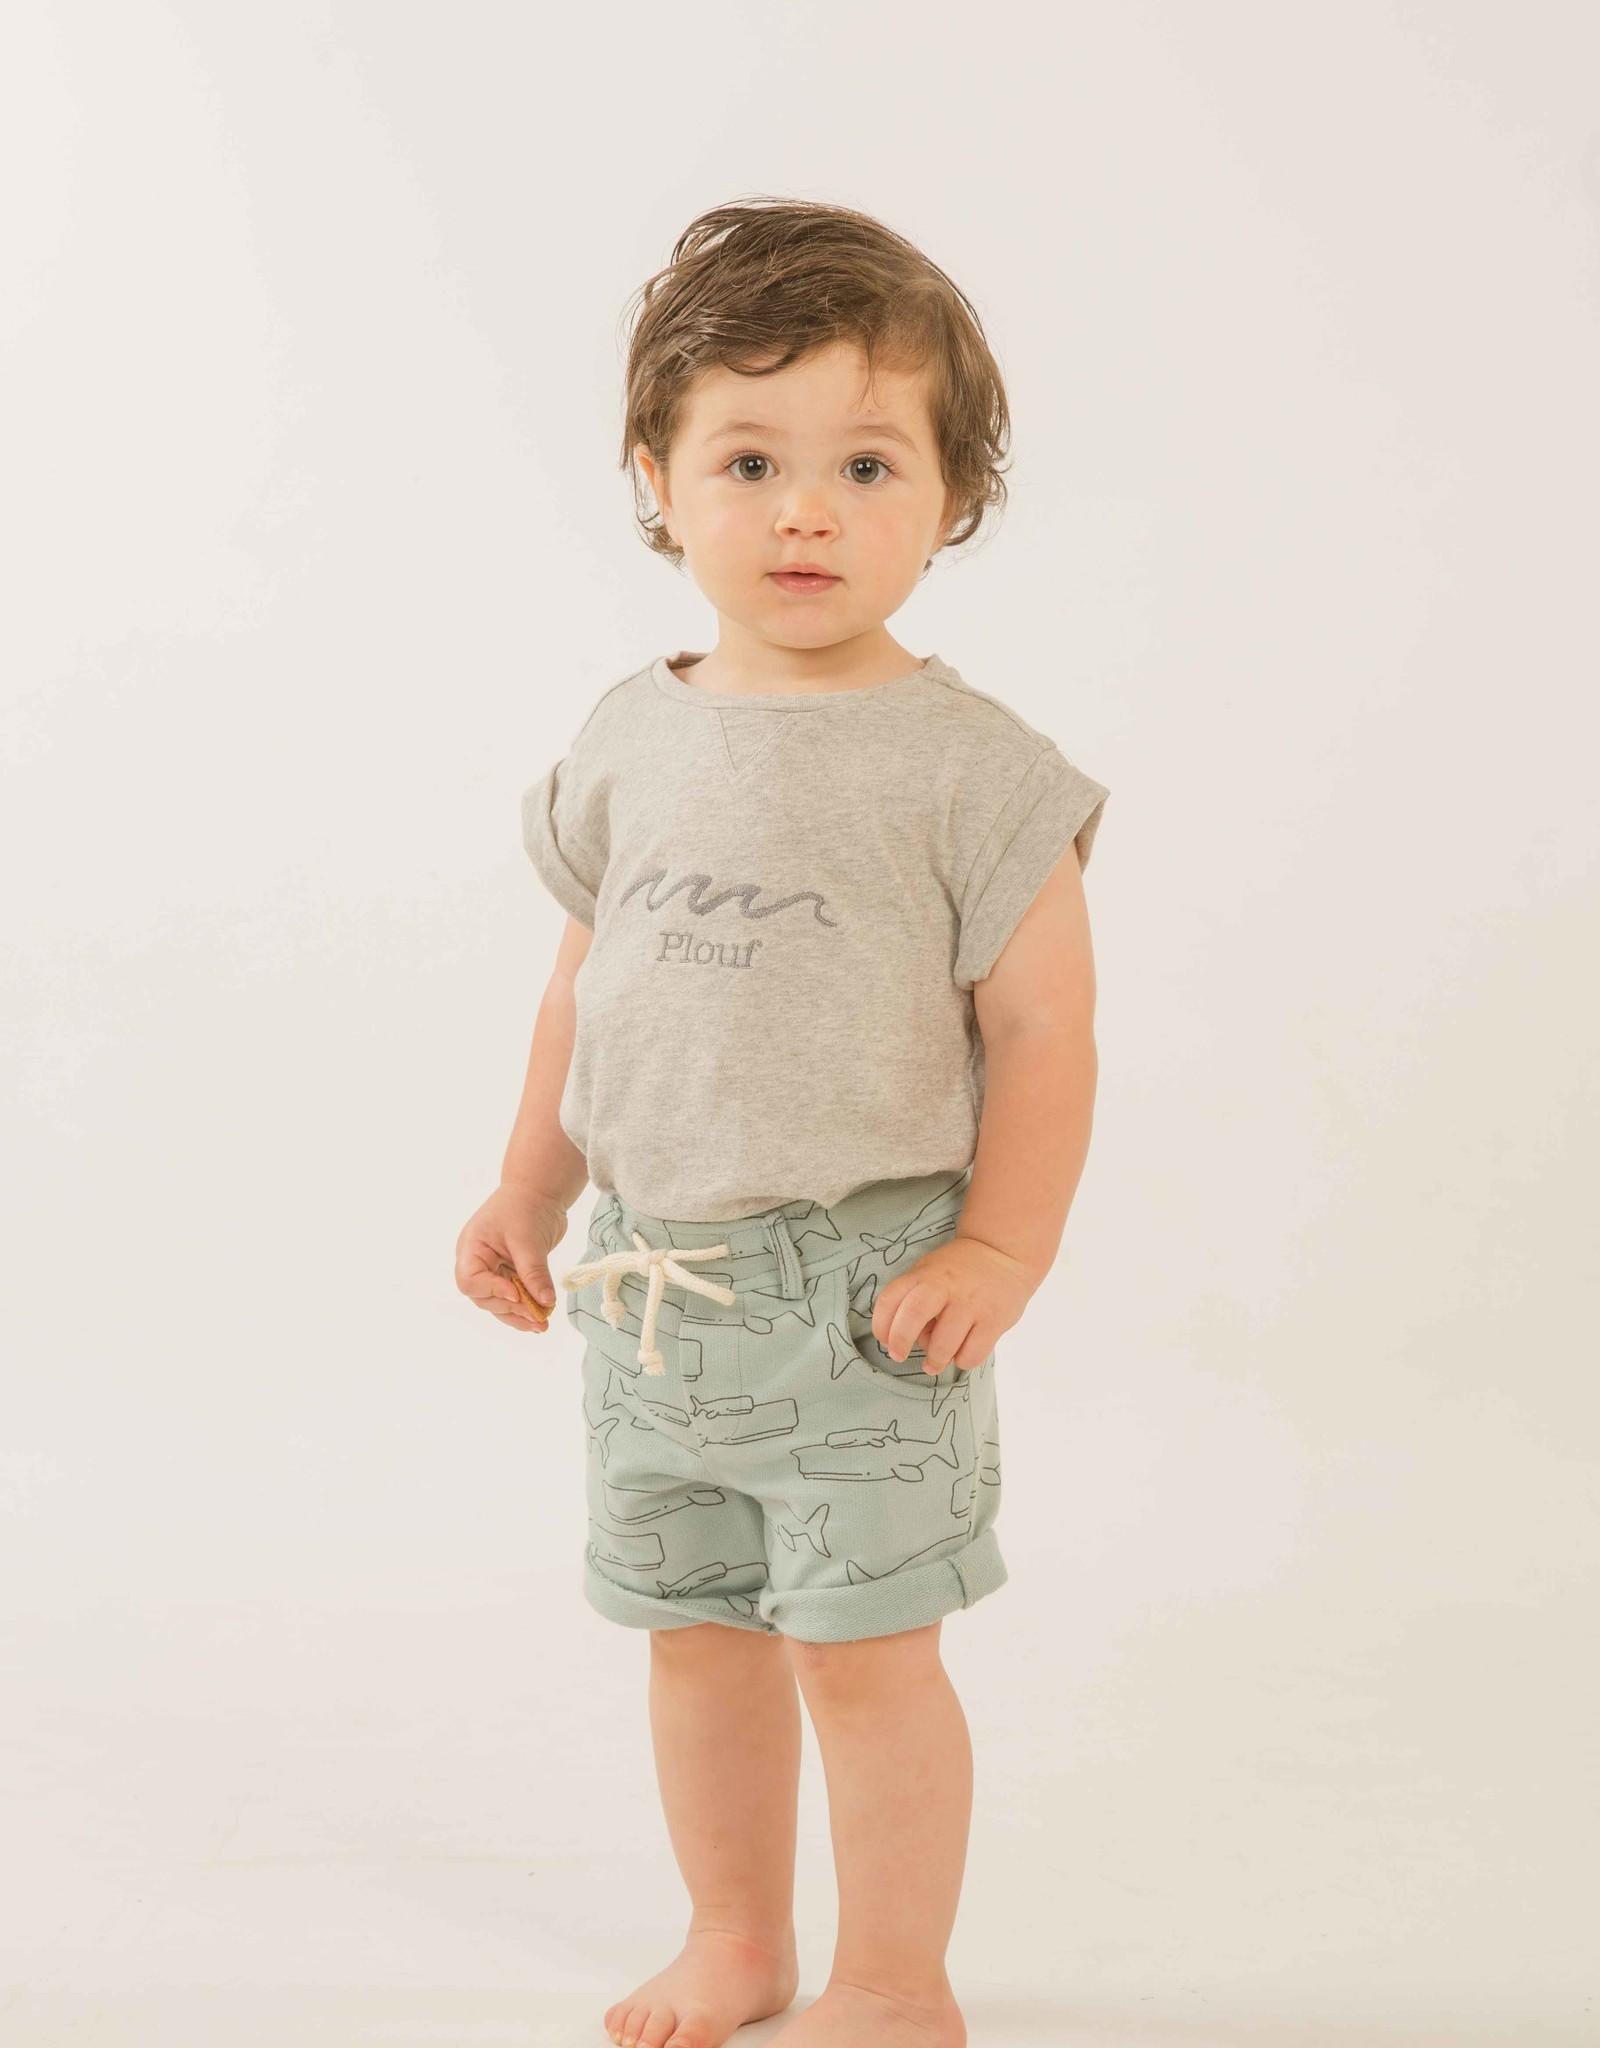 Les Petites Choses T-shirt Plouf